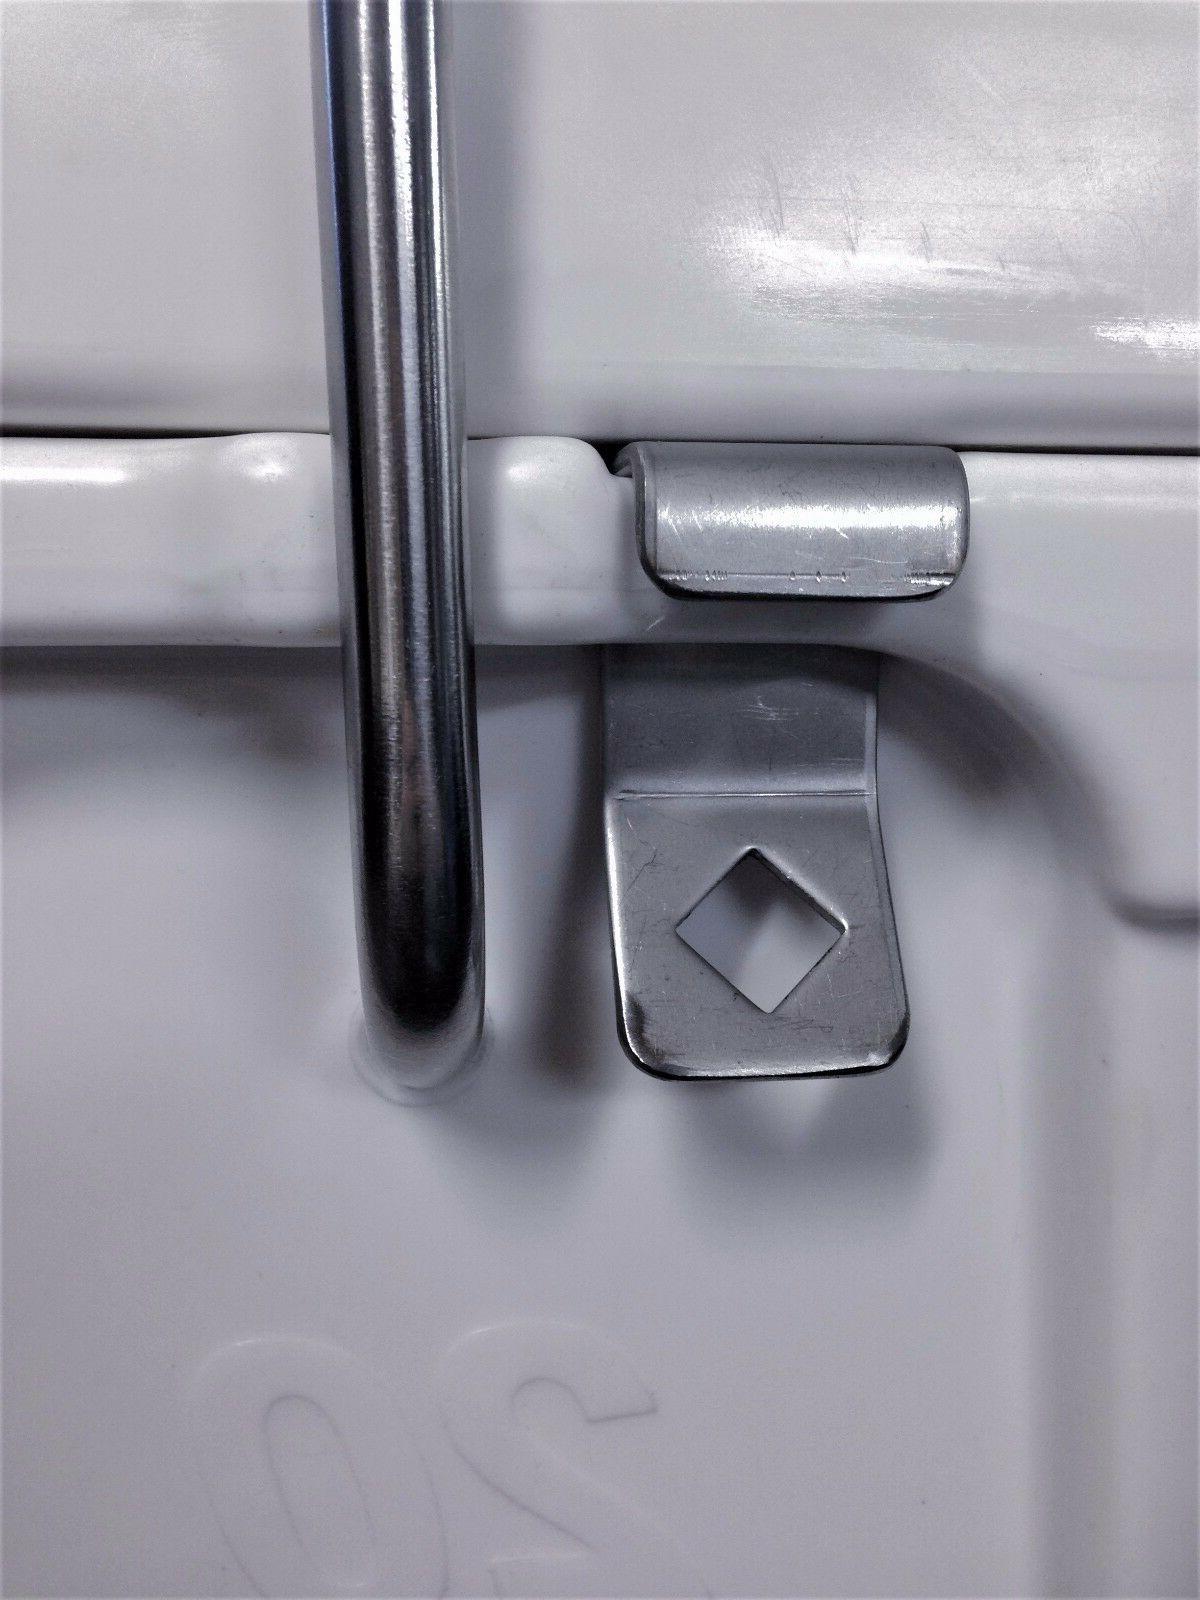 RTIC20 Lock Bracket - Thick Steel